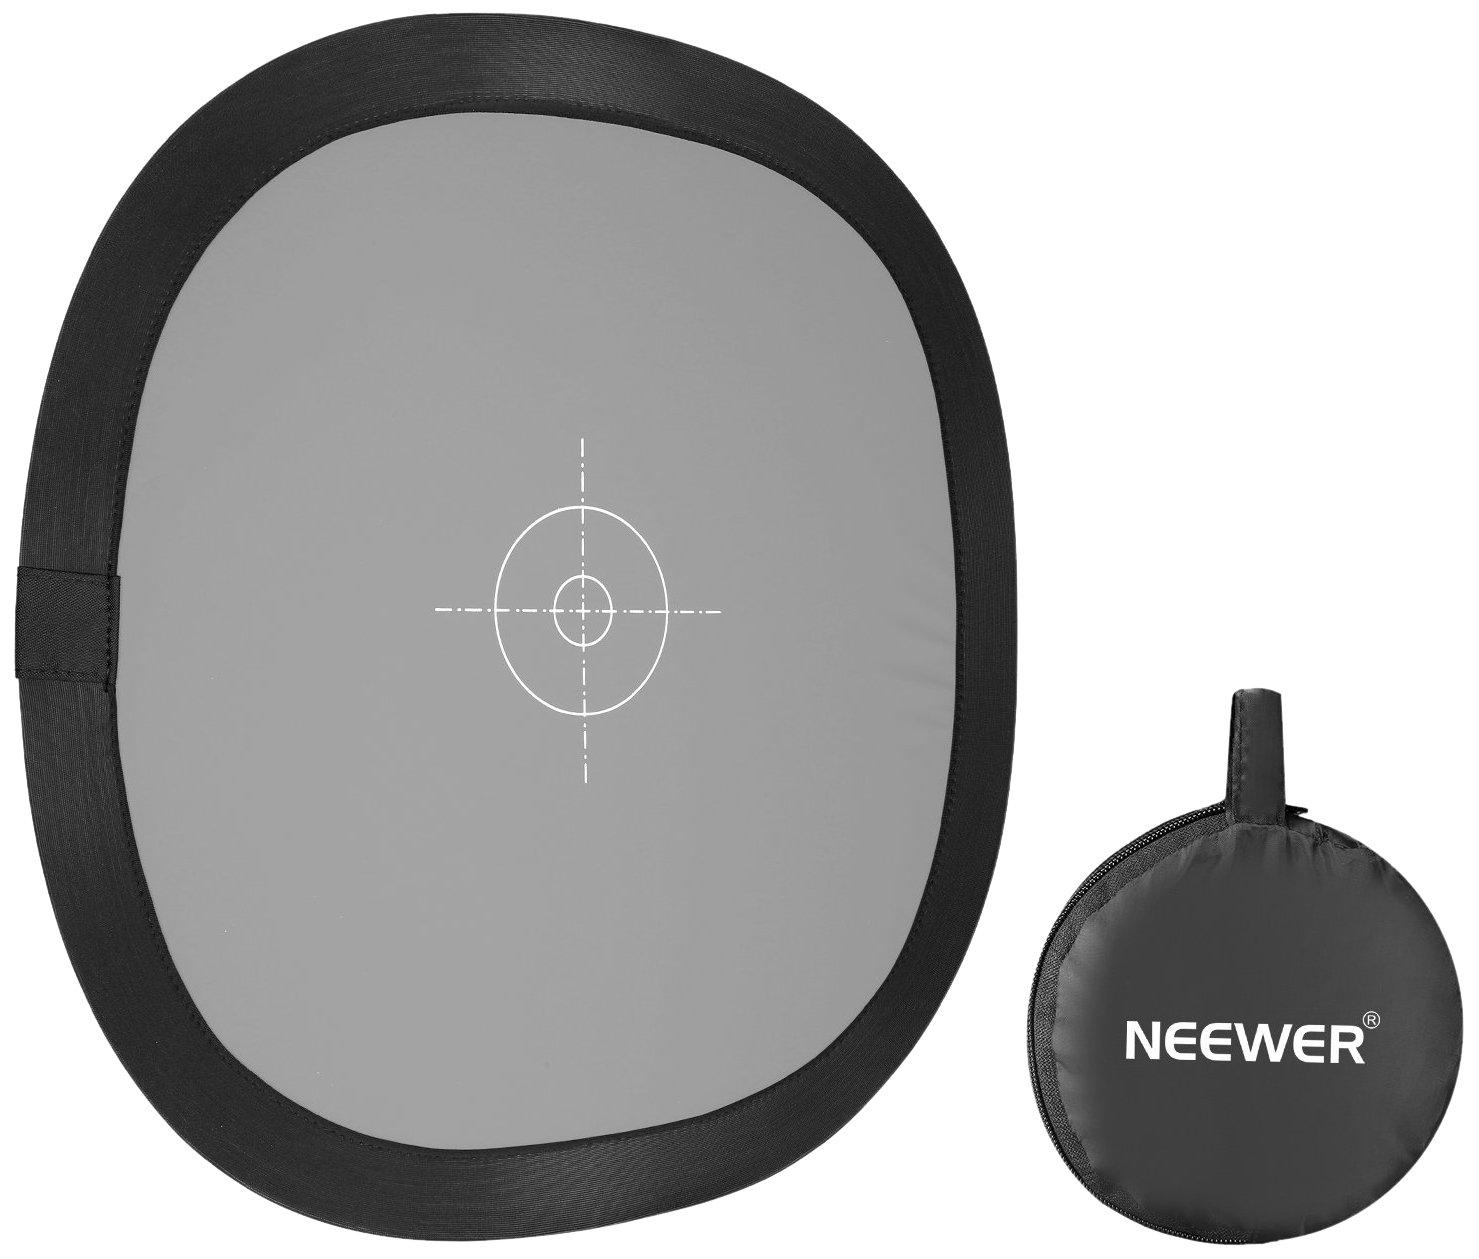 Amazon.com: Neewer – Gris/doble cara tarjeta de balance de ...